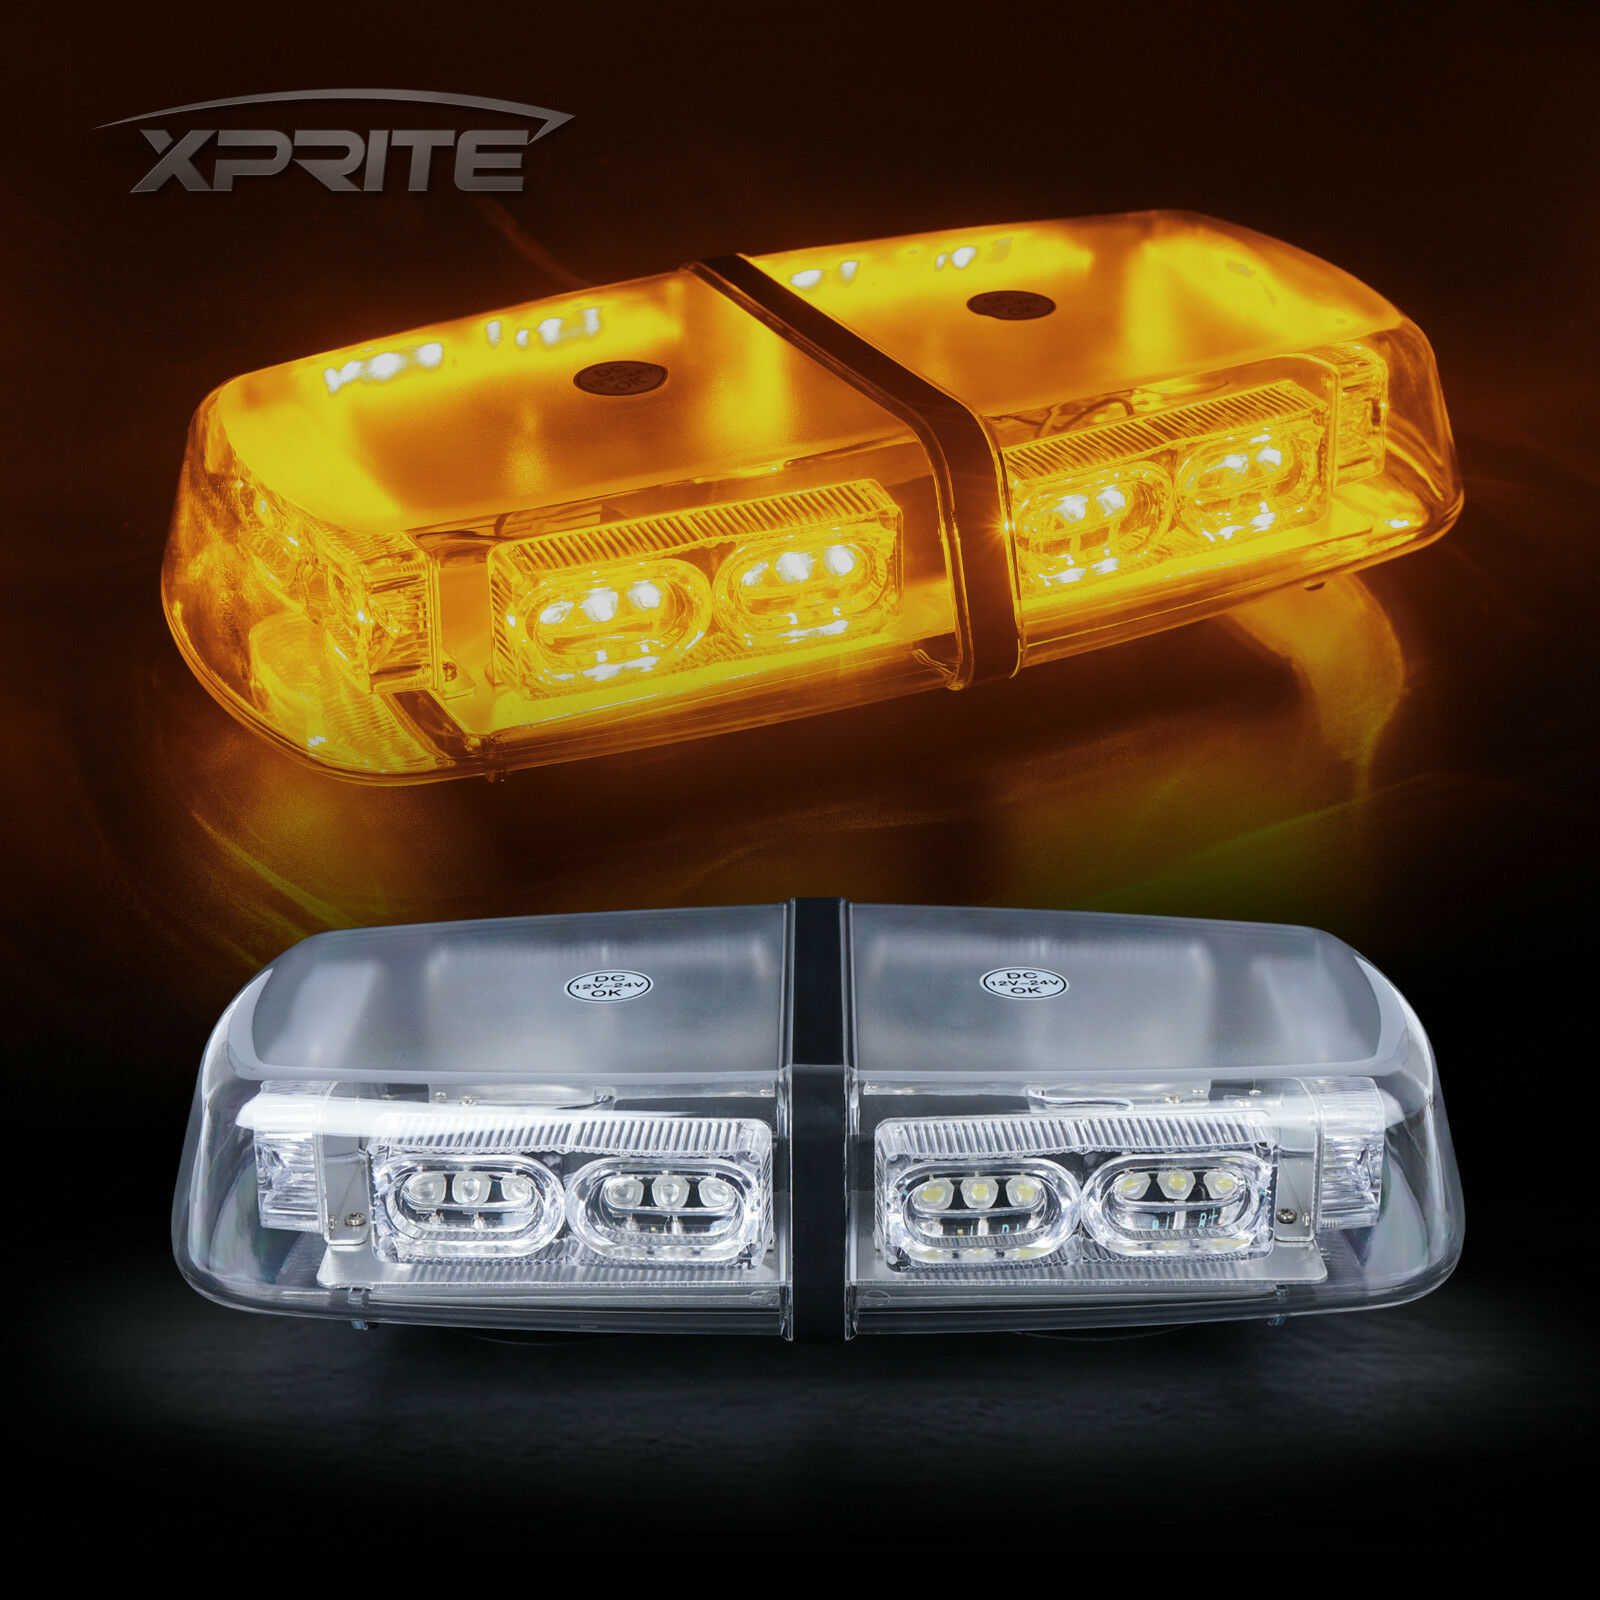 Xprite 18w 36 Led Top Roof Flash Emergency Mini Strobe